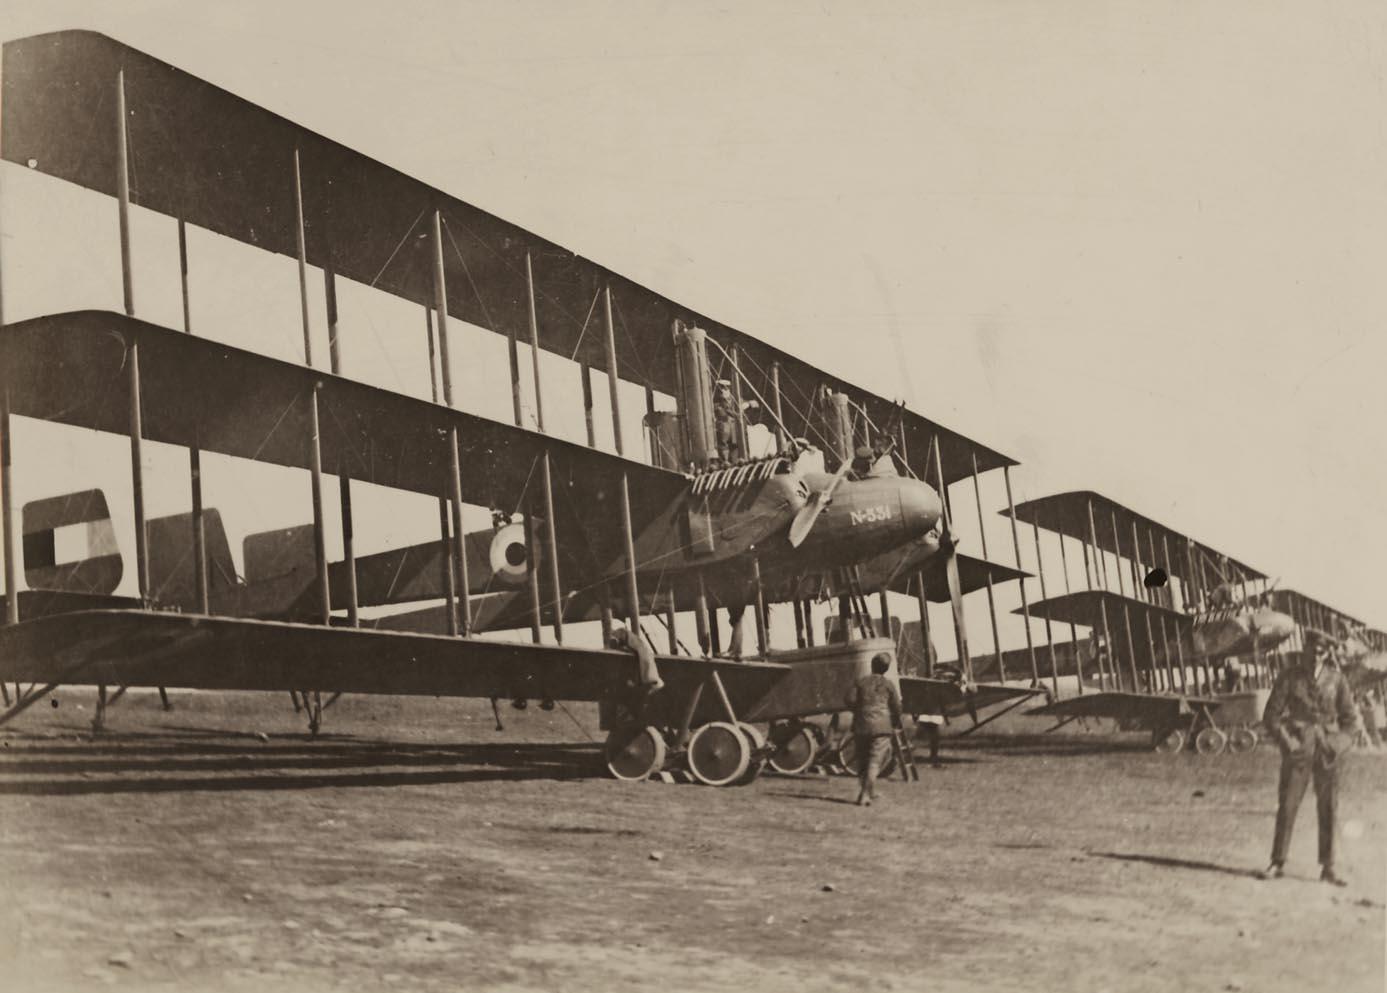 Caproni_Ca.42